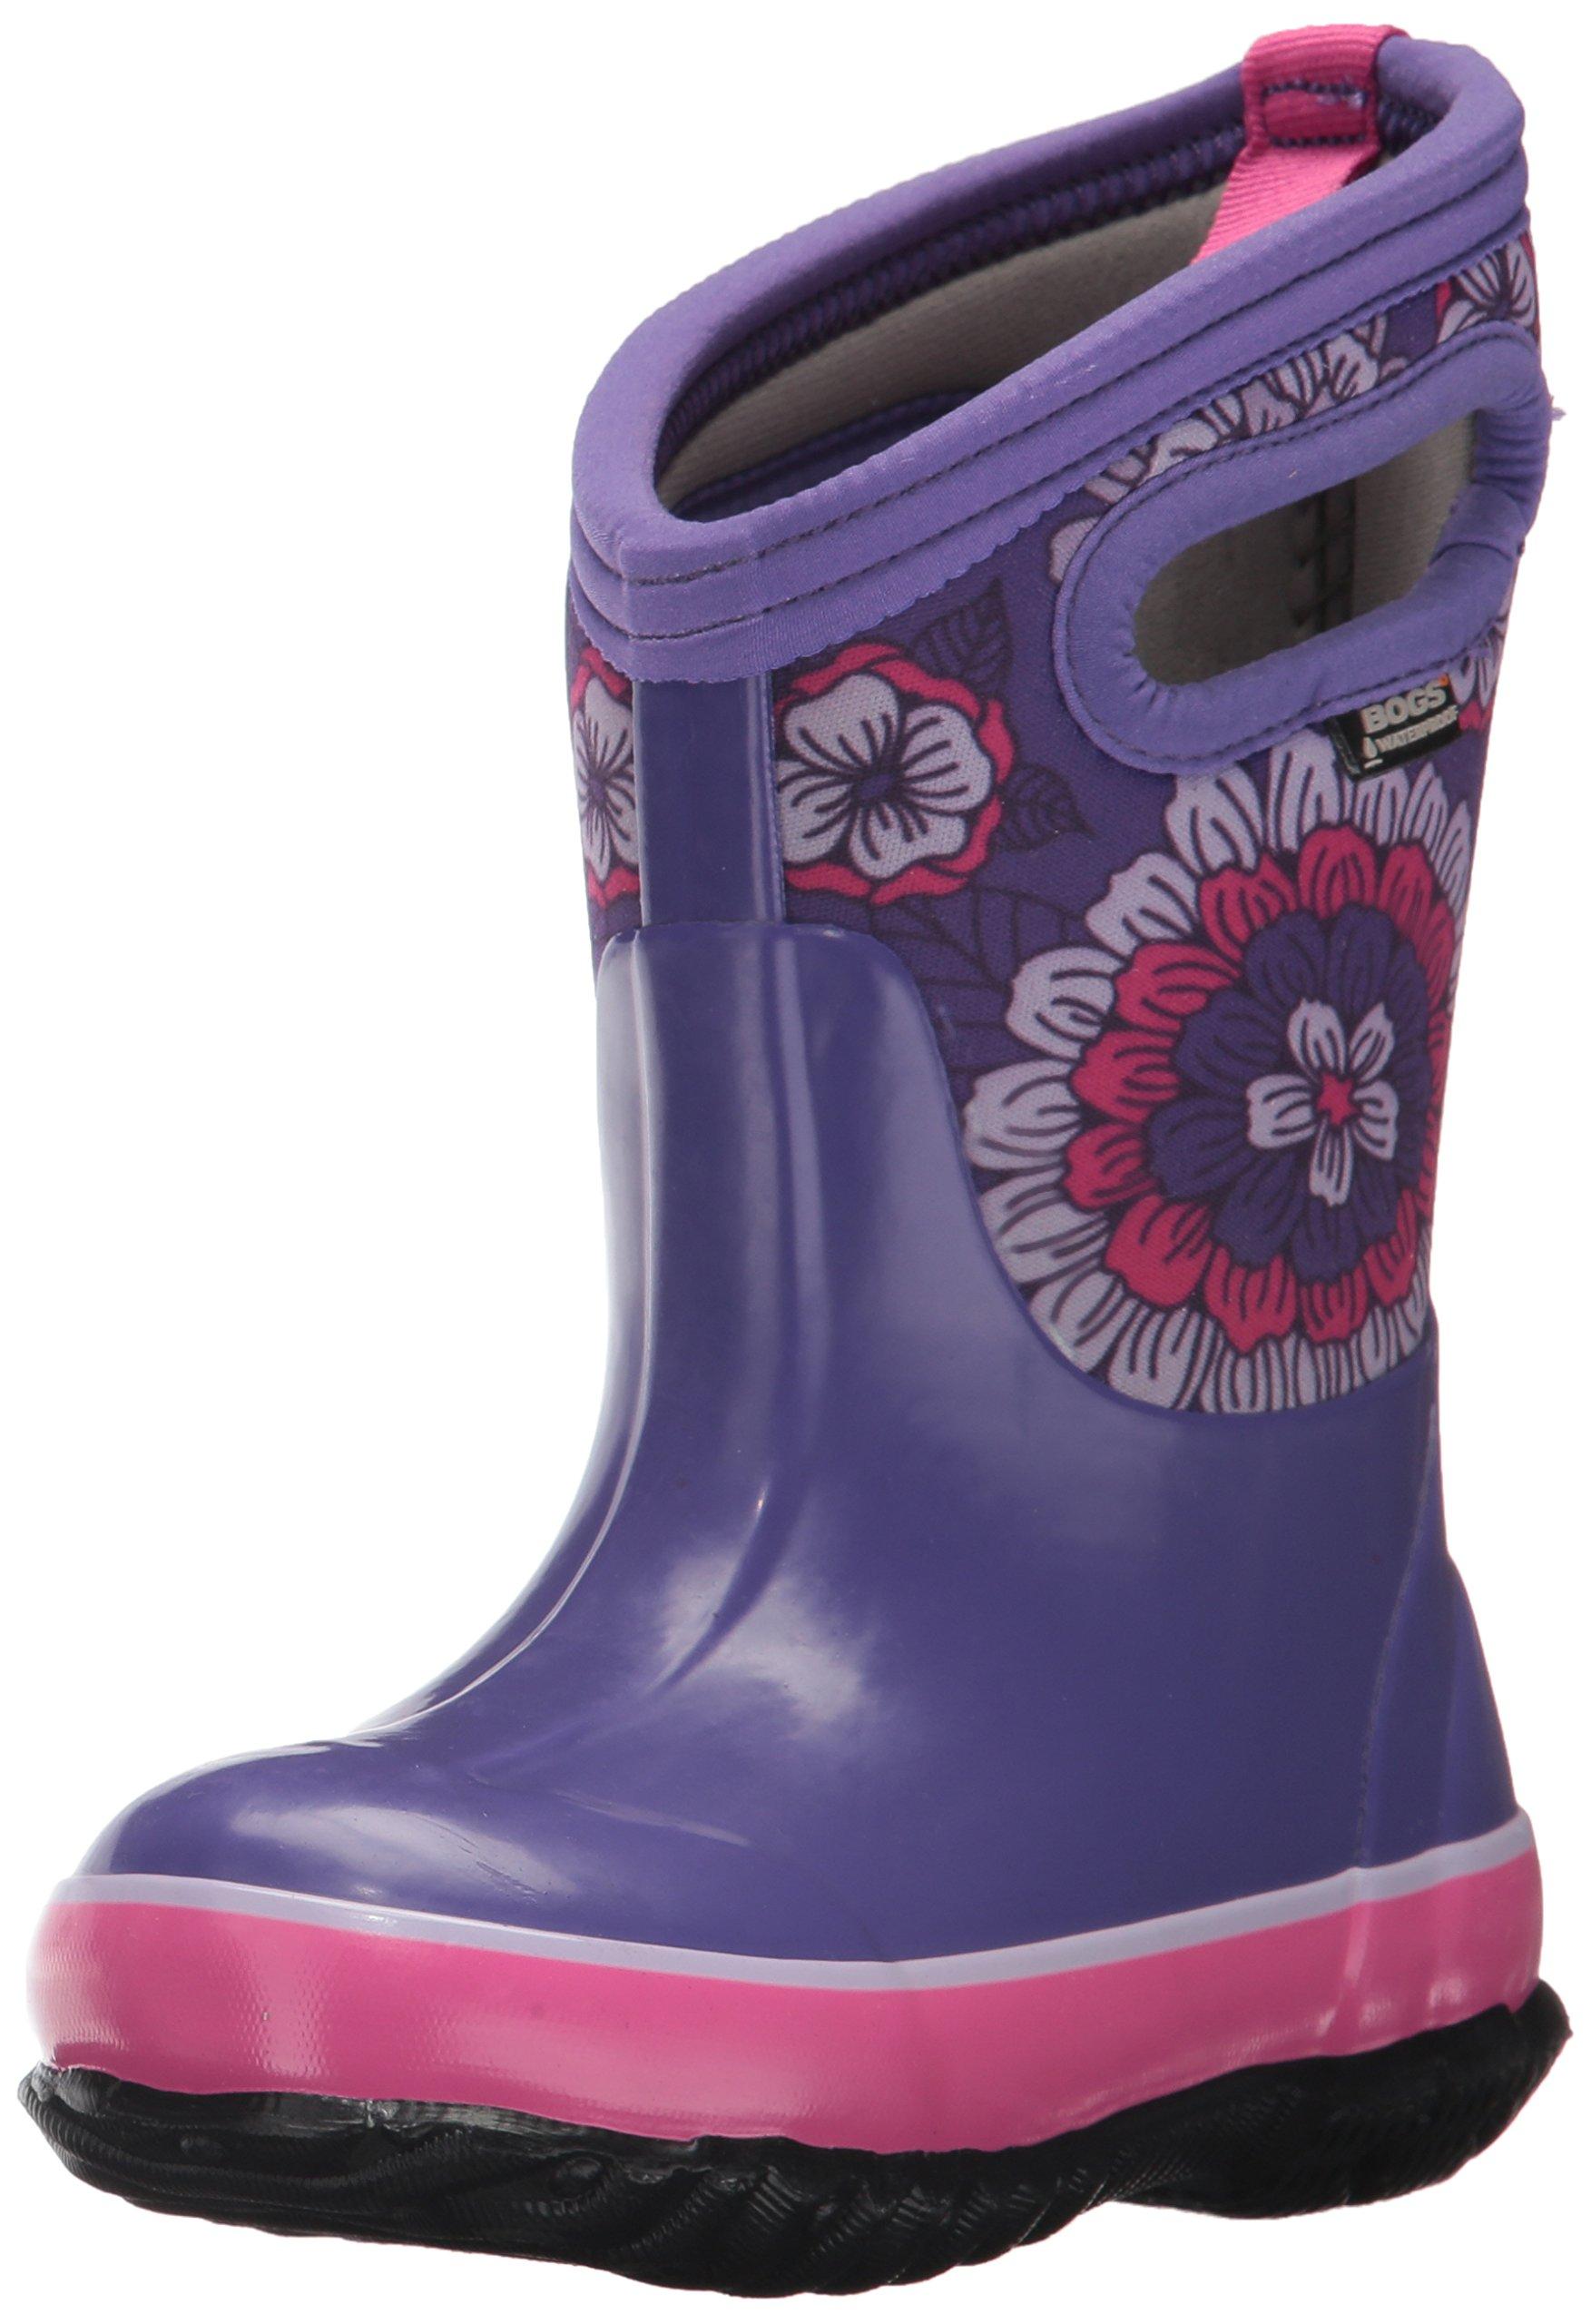 Bogs Classic High Waterproof Insulated Rubber Neoprene Rain Boot Snow, Pansies Print/Purple/Multi, 4 M US Big Kid